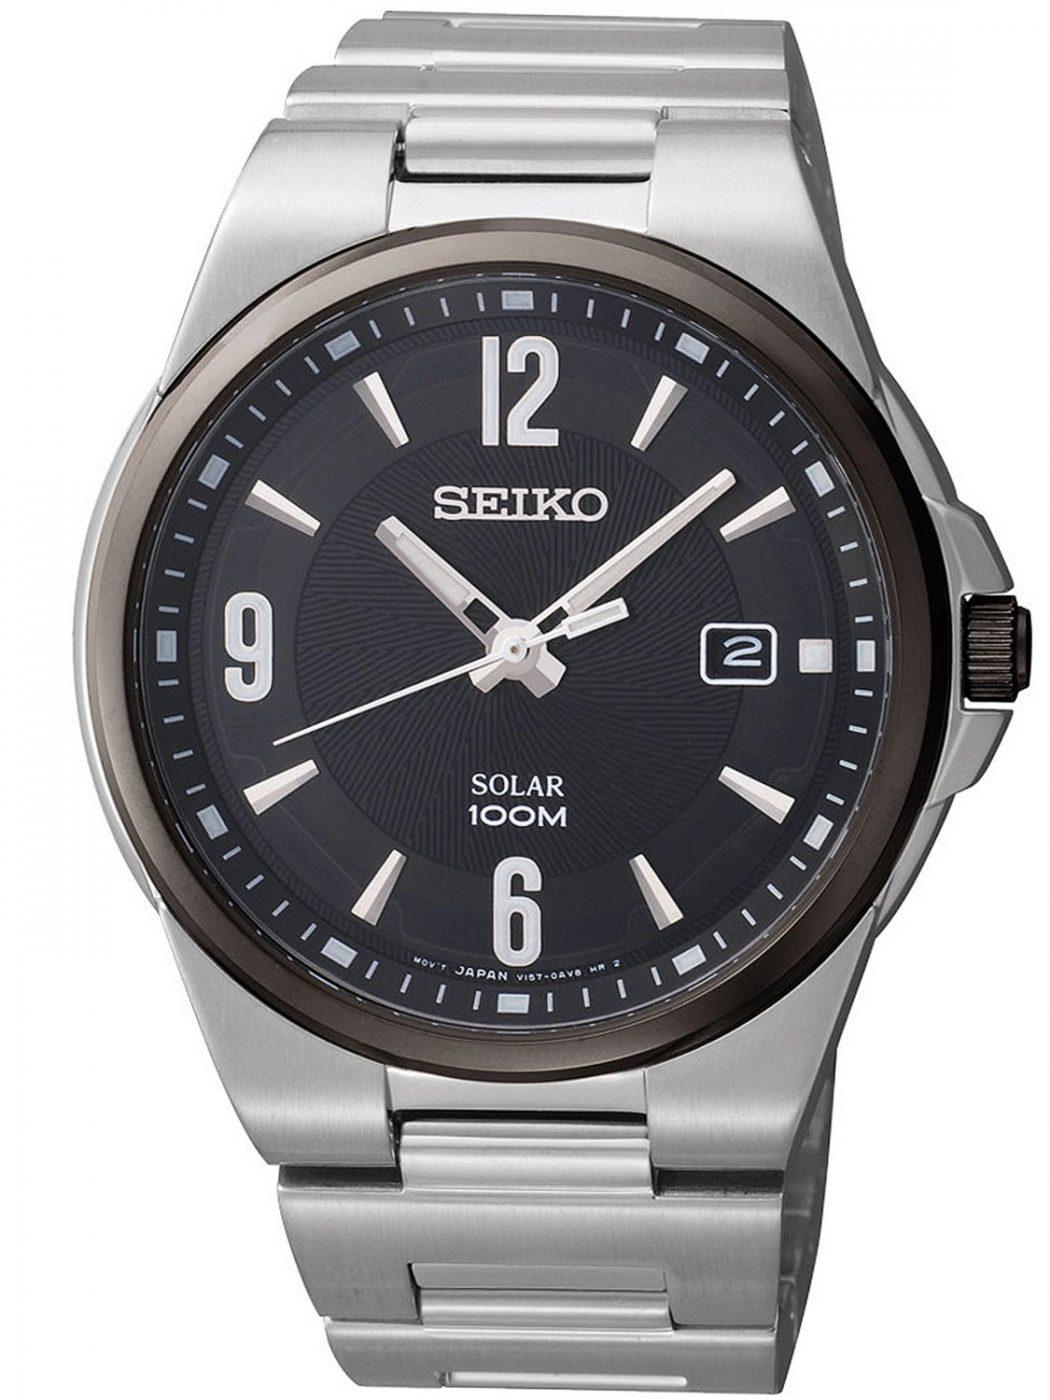 splar-100m Most 35 Stylish Solar Powered Timepieces